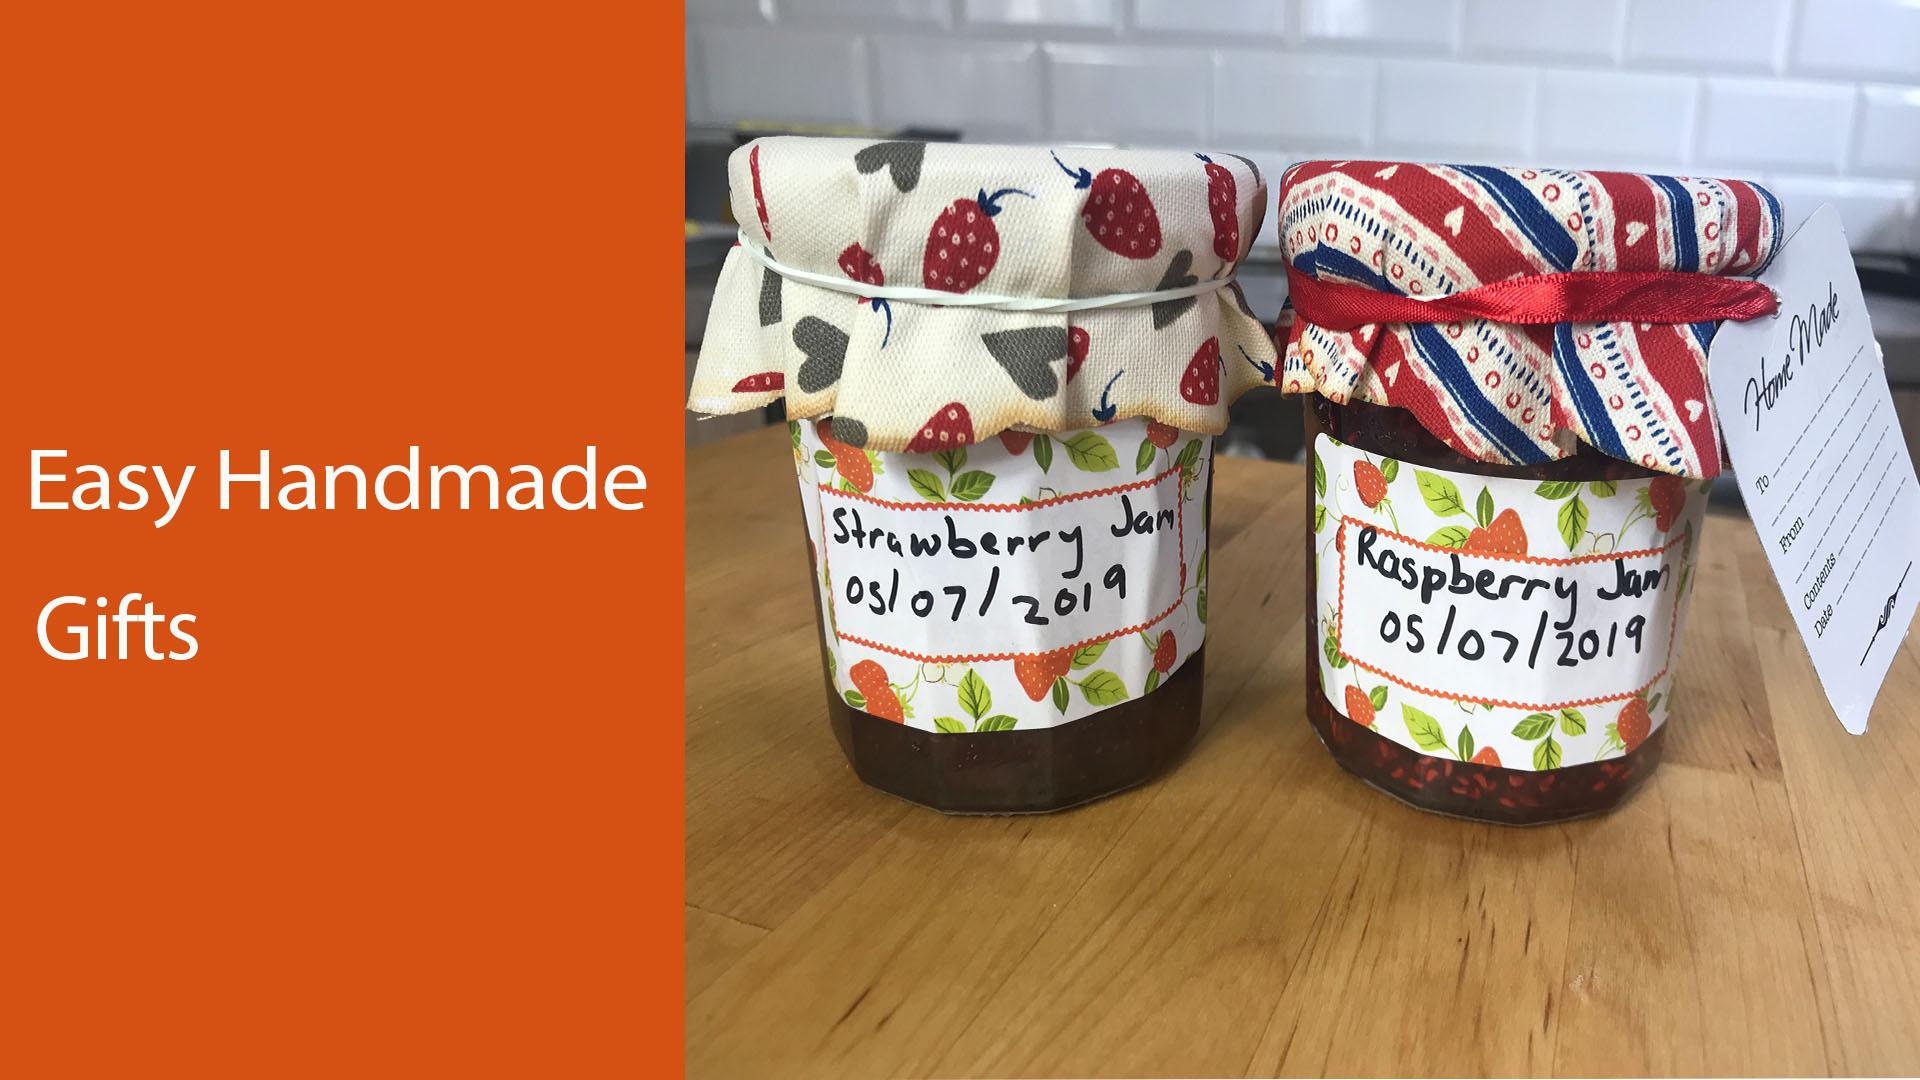 Homemade jam in jam jars